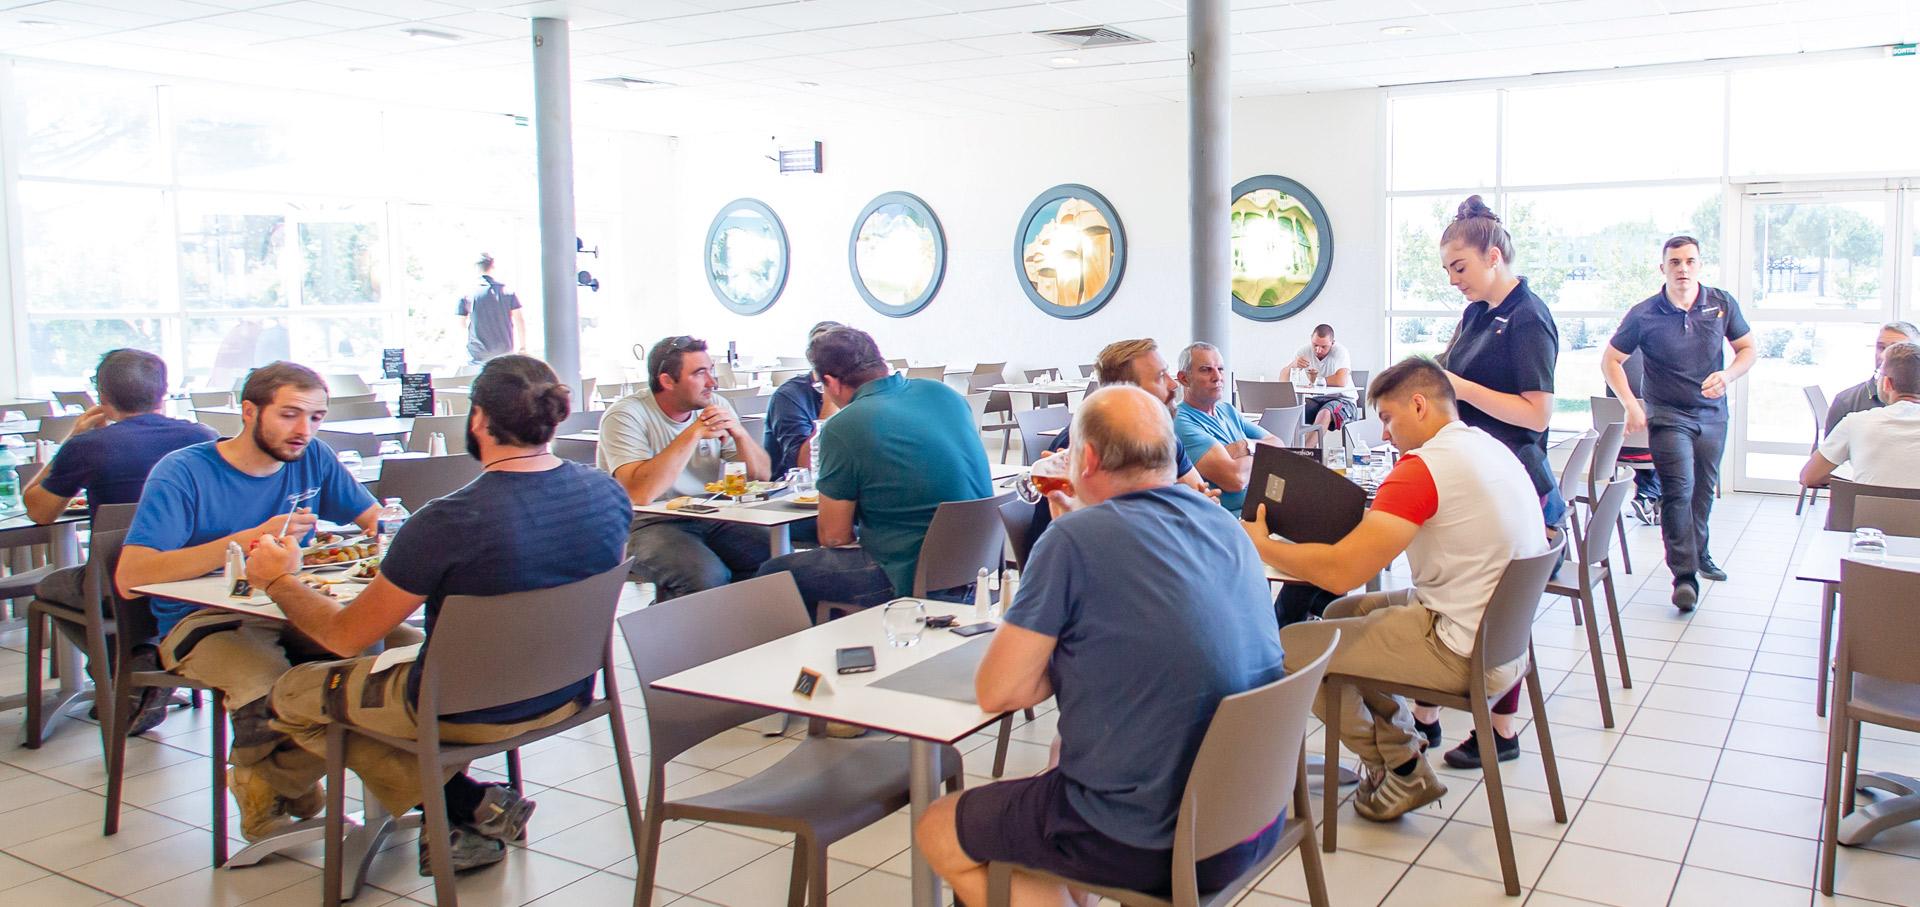 truck-etape-beziers-reservation-restaurant2